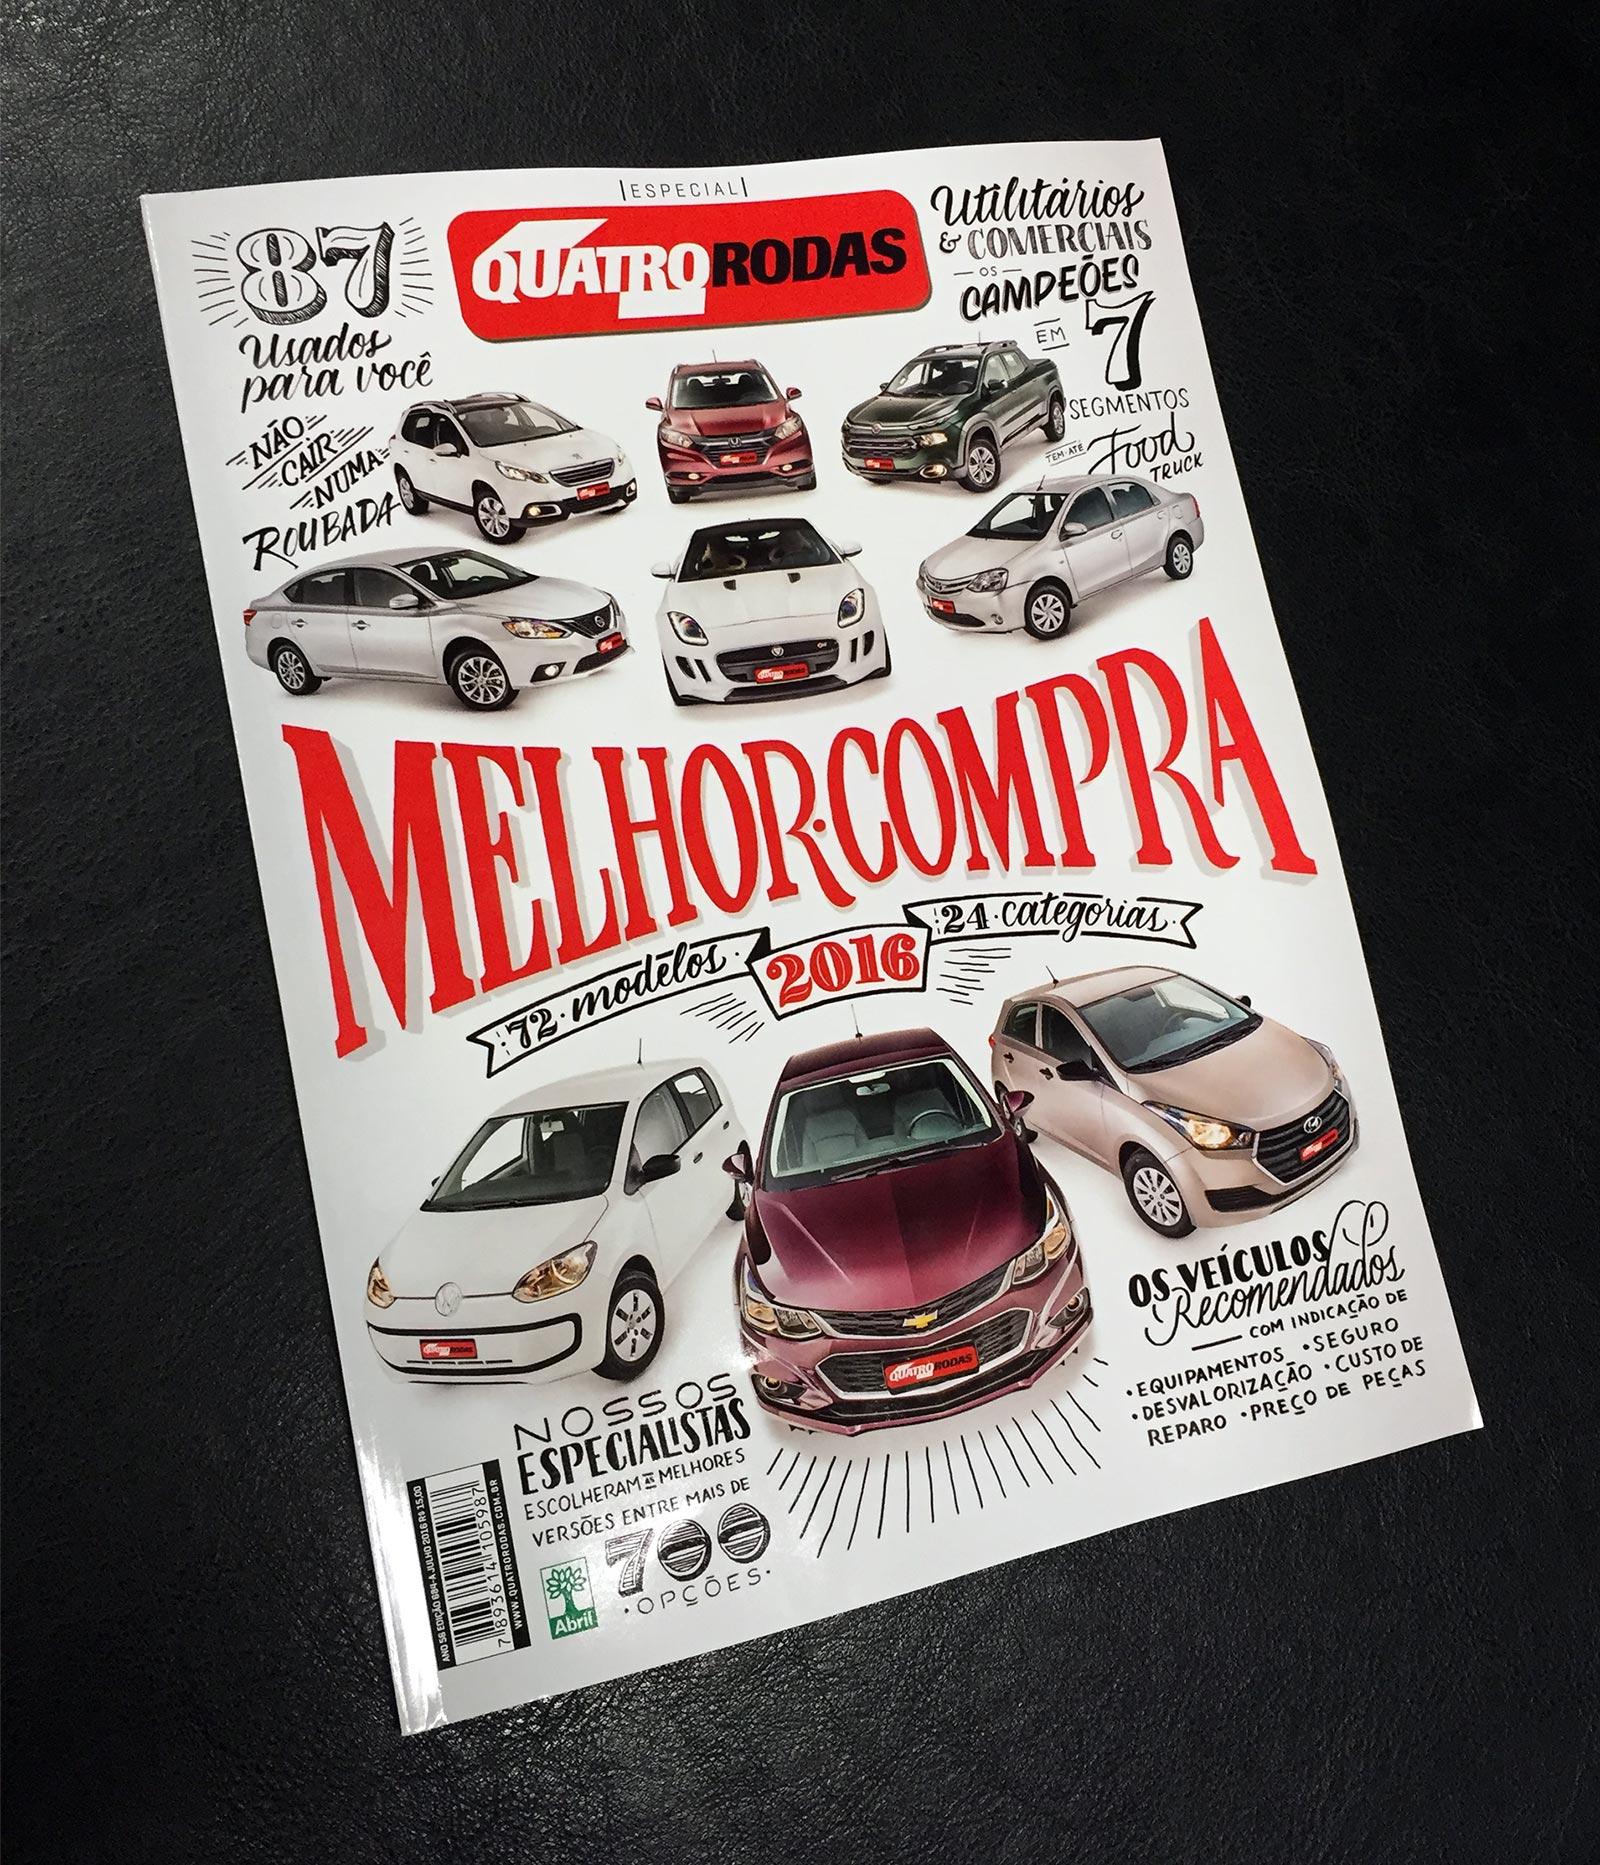 MELHORCOMPRA_VICTOR_TOGNOLLO_IMG1